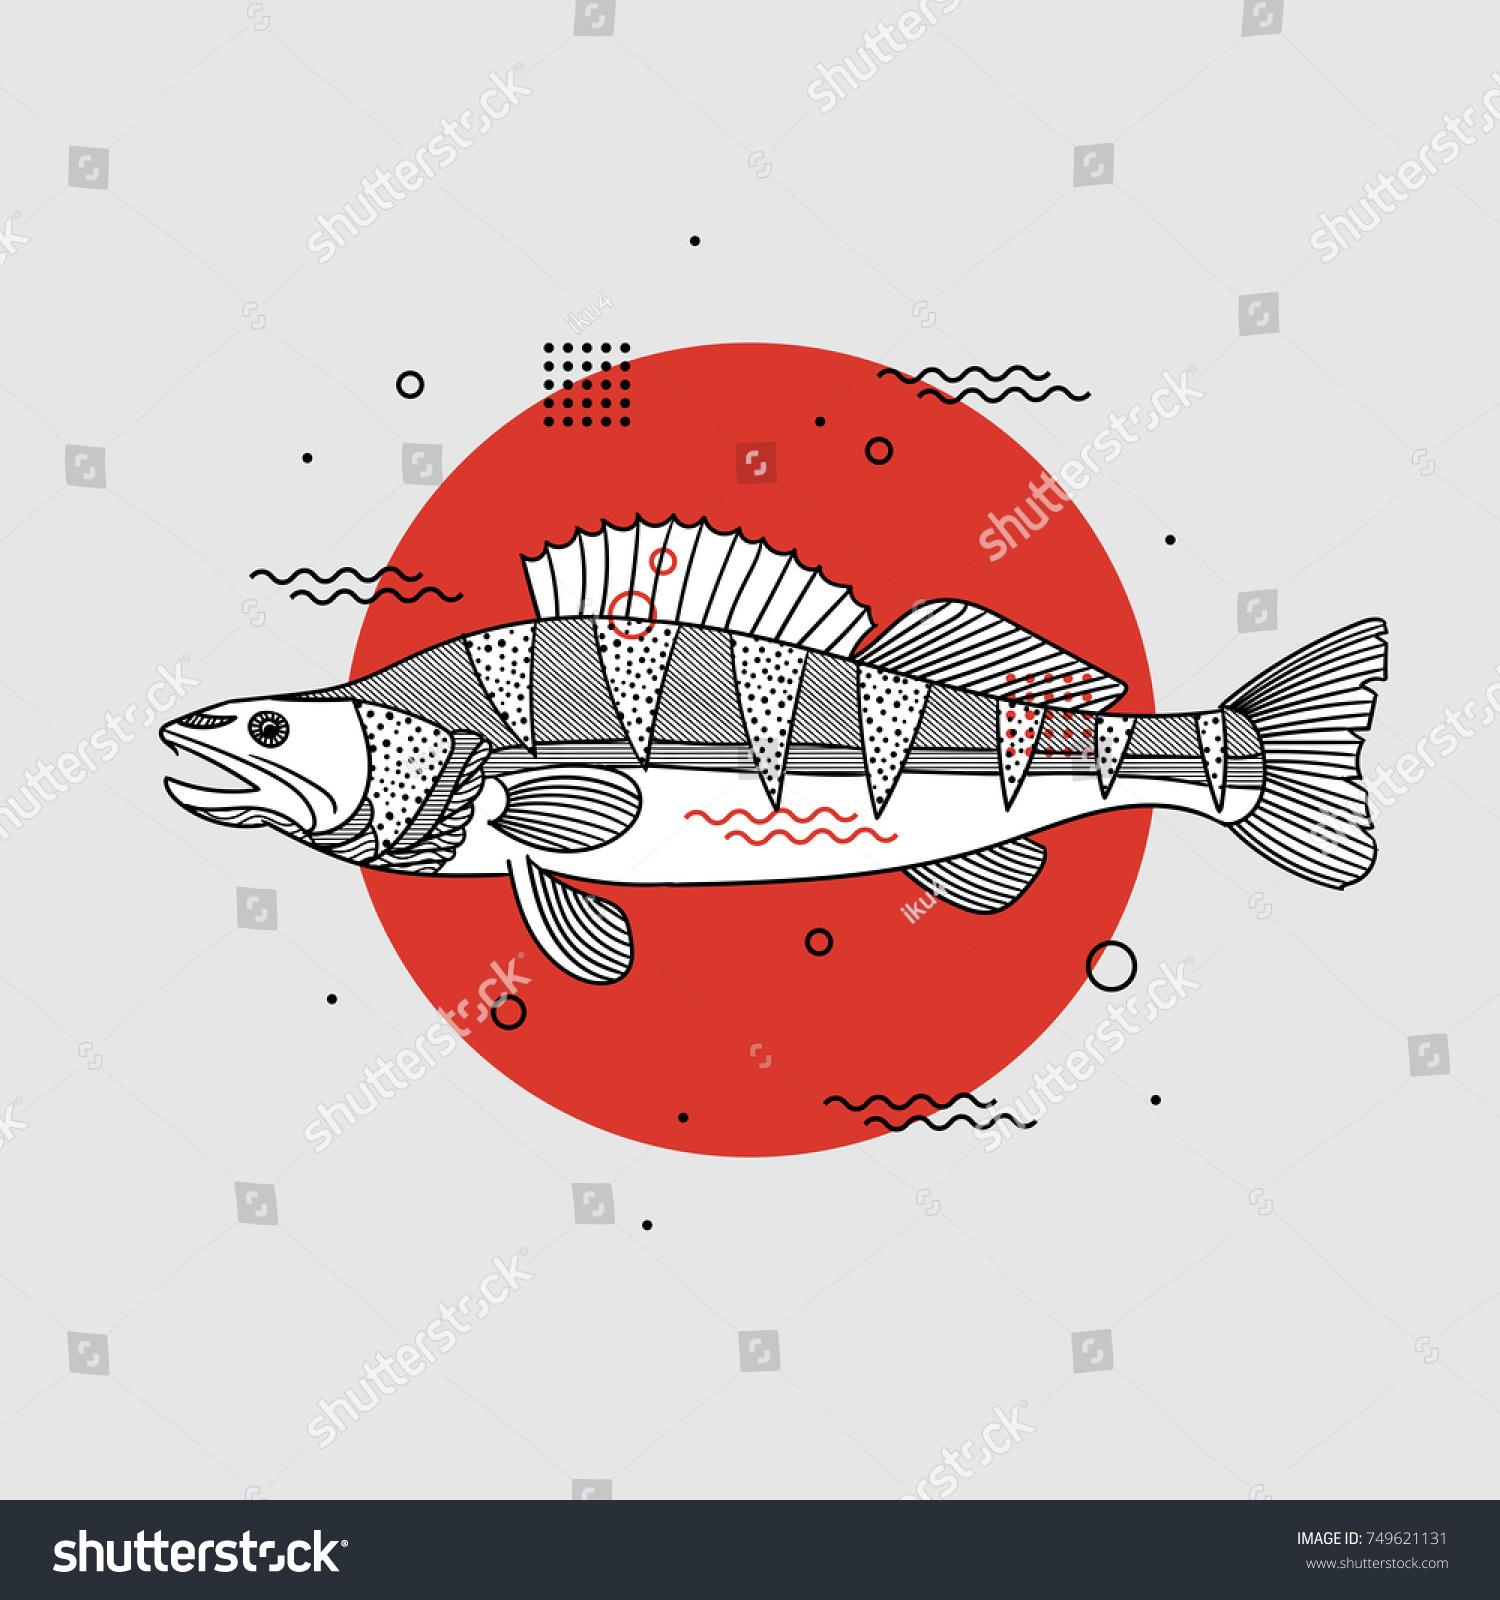 Fish Geometric Shapes Seafood Design Bar Stock Vector 749621131 ...